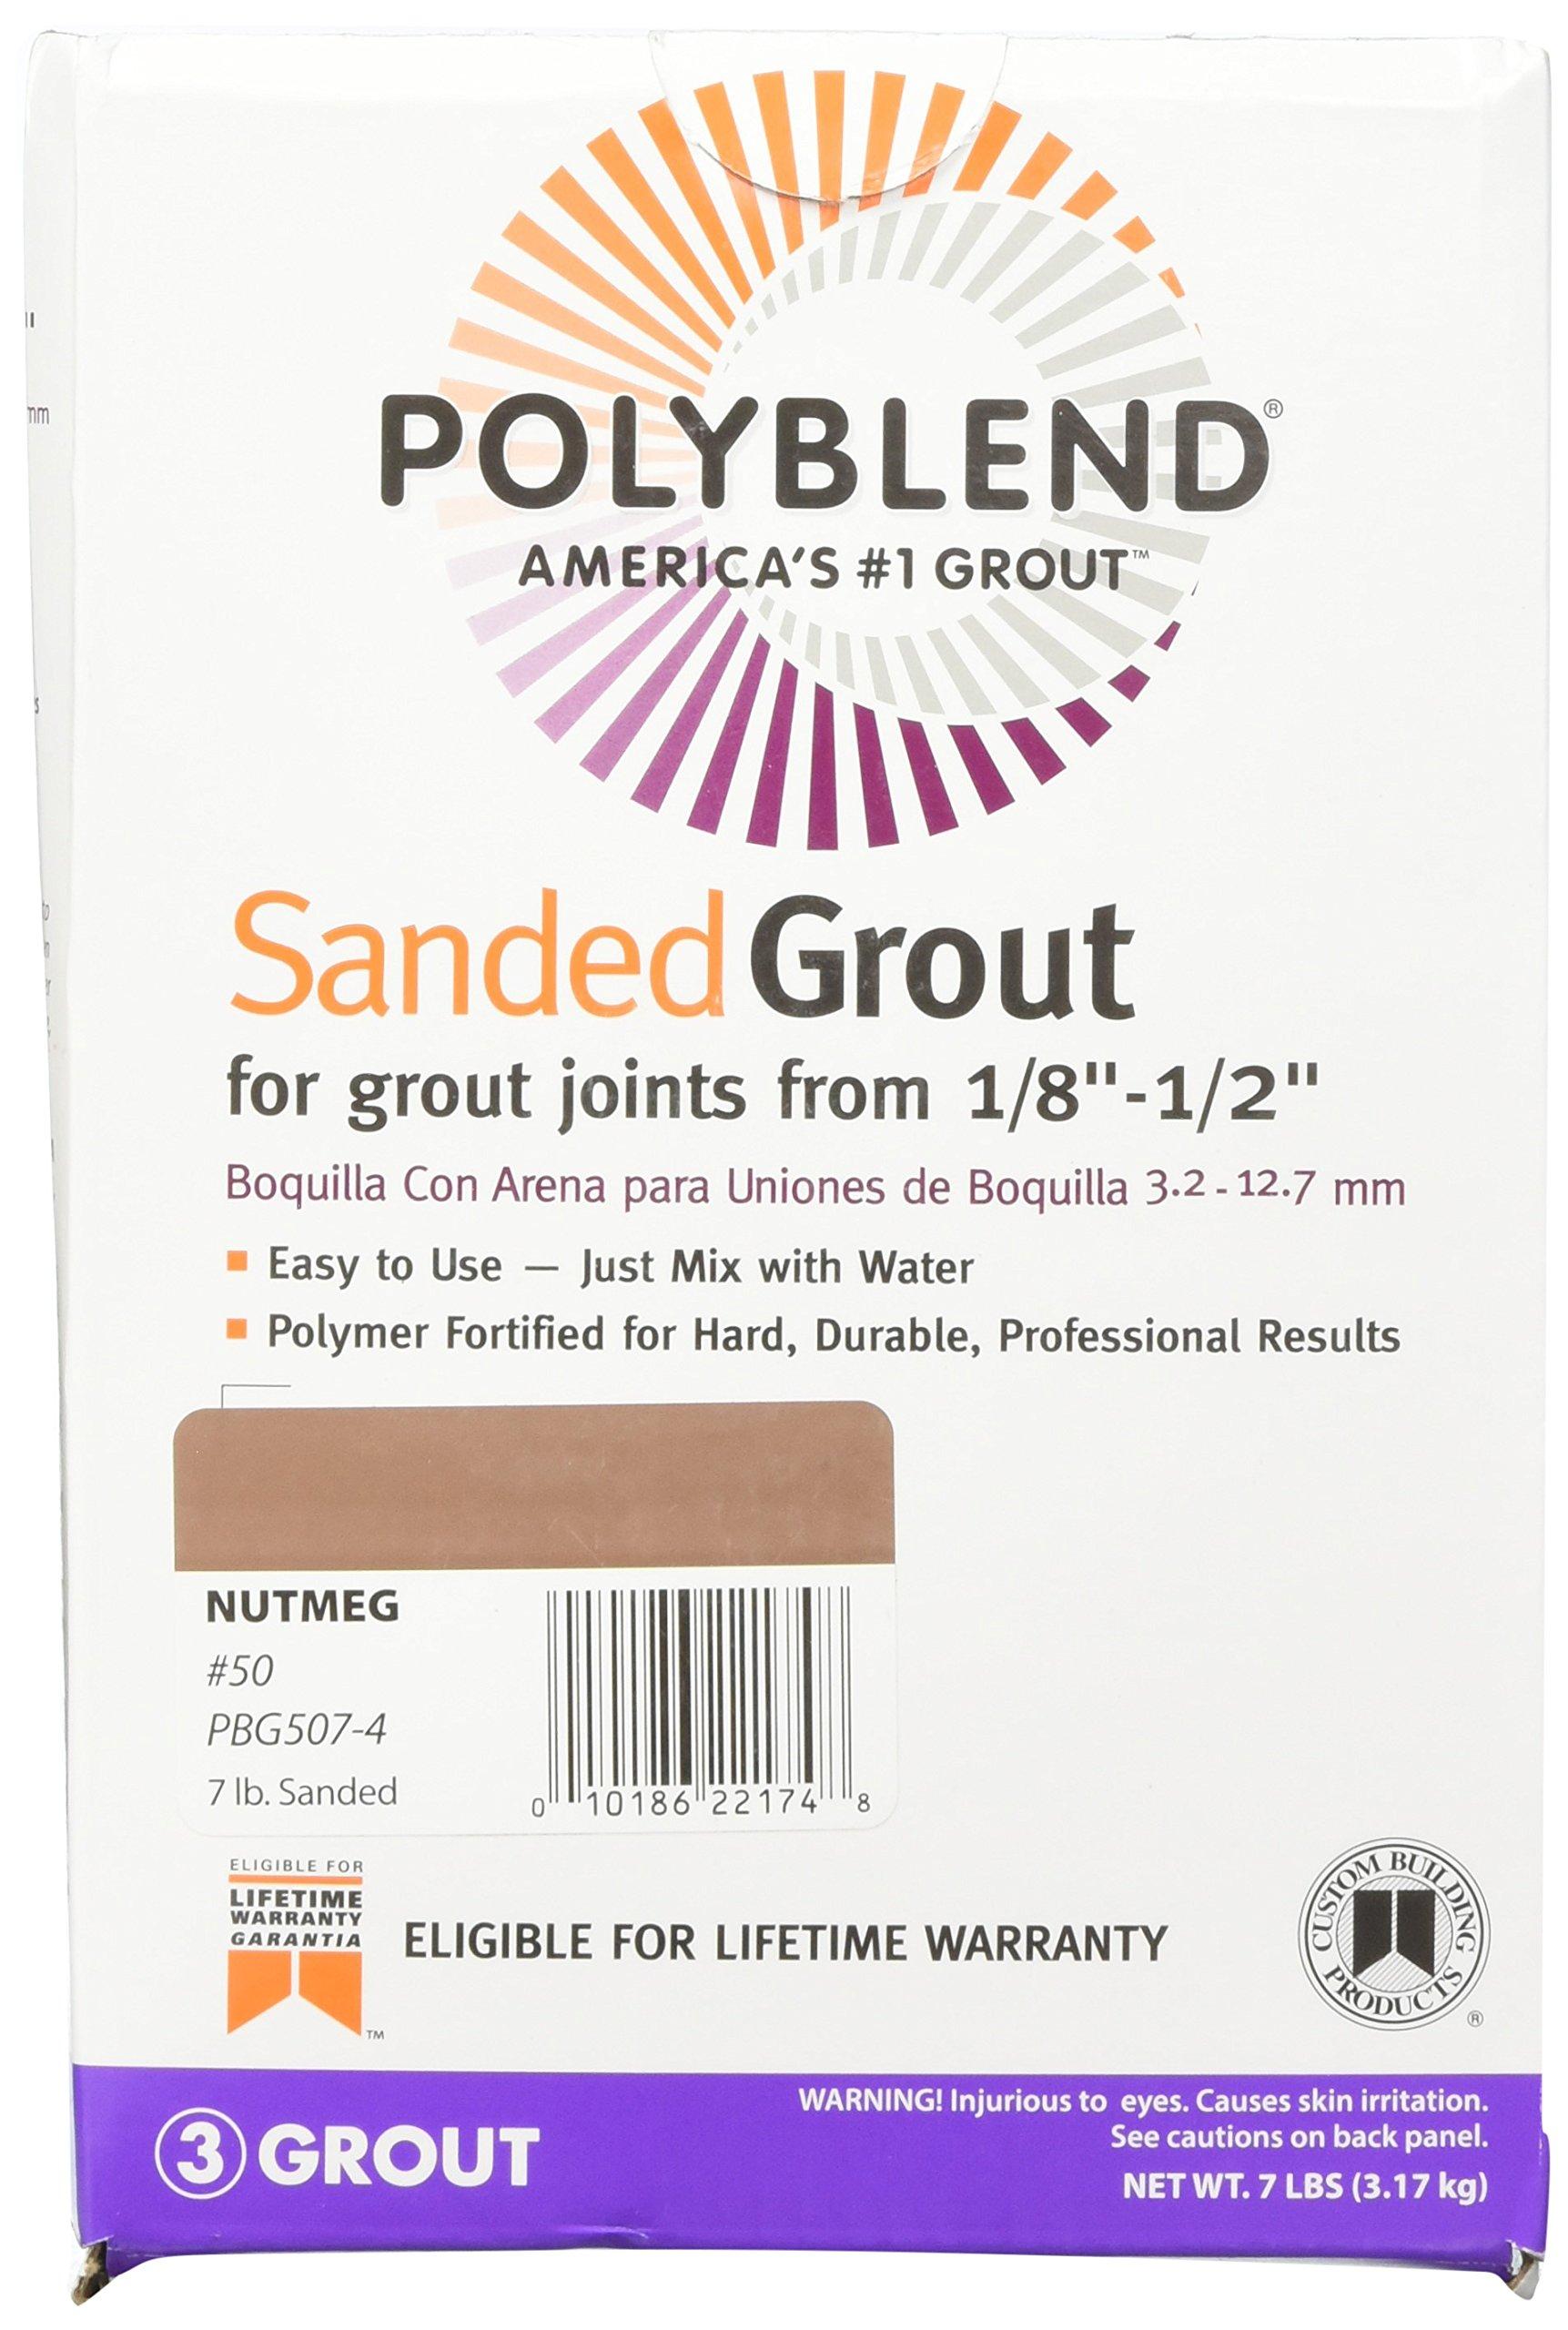 CUSTOM BLDG PRODUCTS PBG507-4 7-Pound Nutmeg Sand Grout